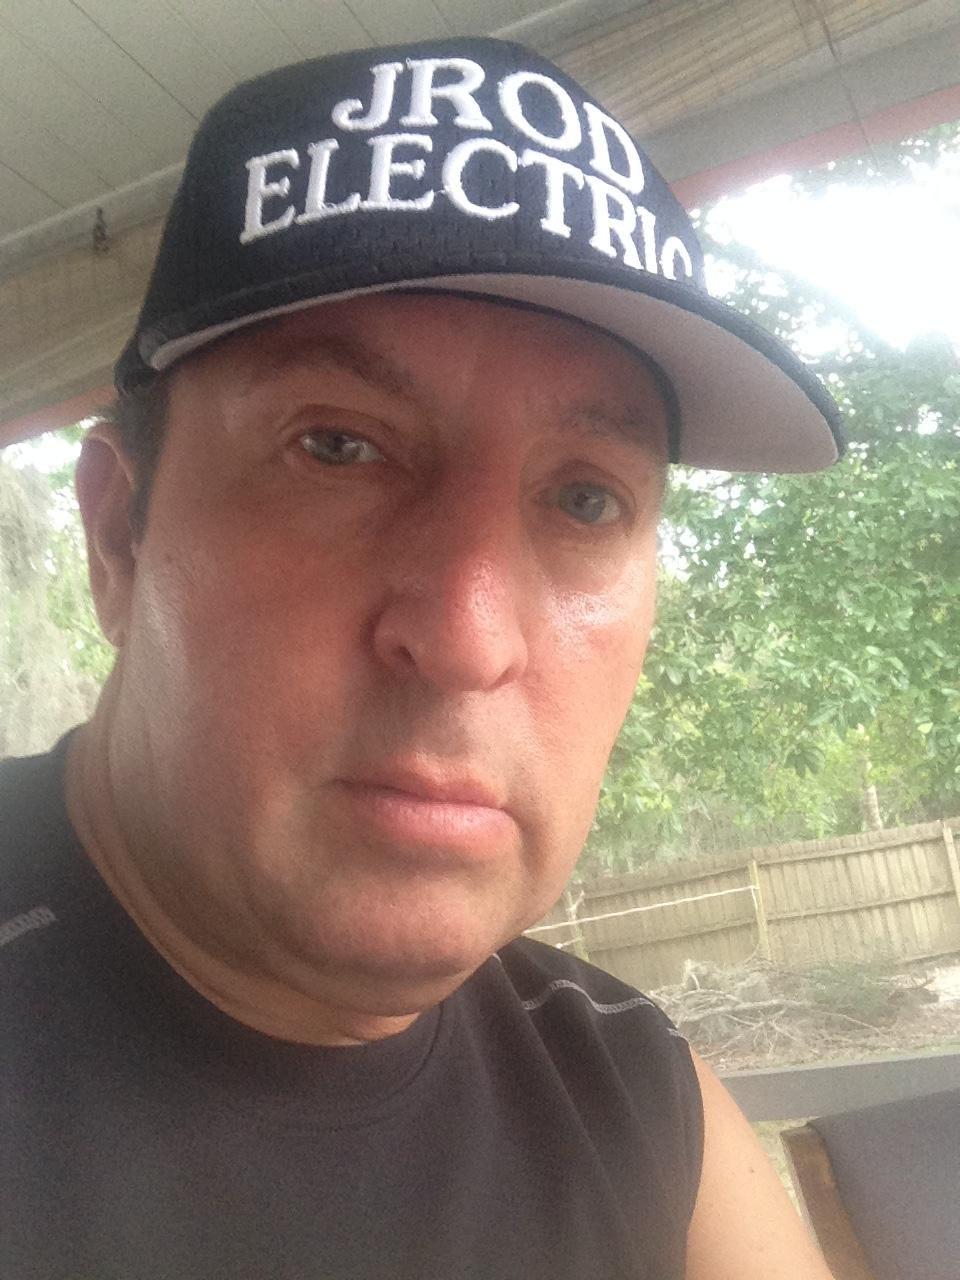 Jrod Electric